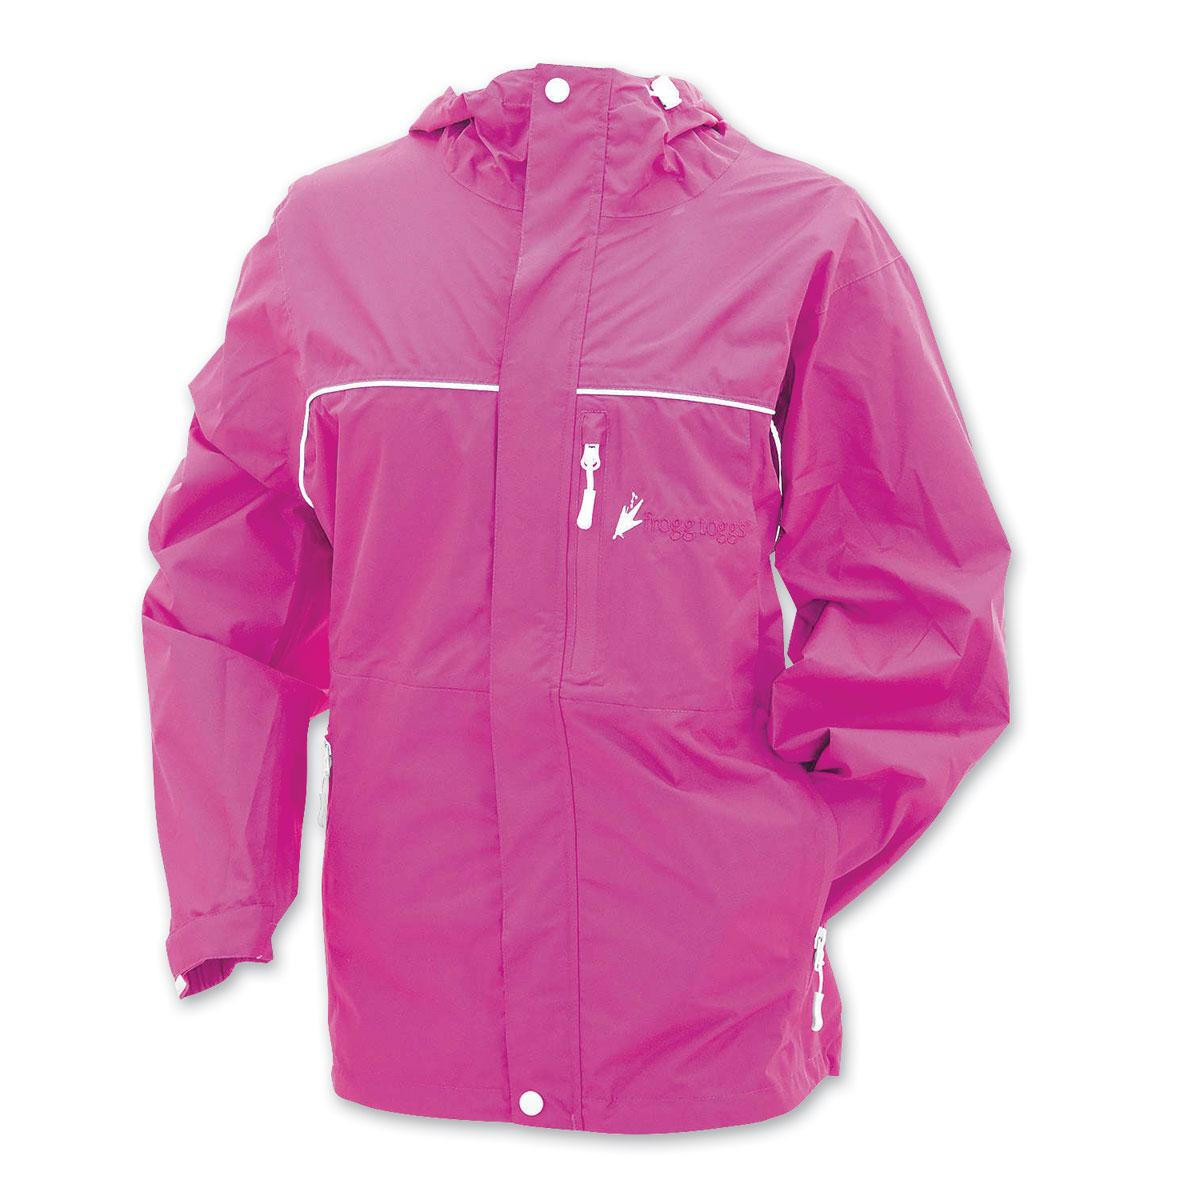 Frogg Toggs Women's Java Toadz Pink Rain Jacket